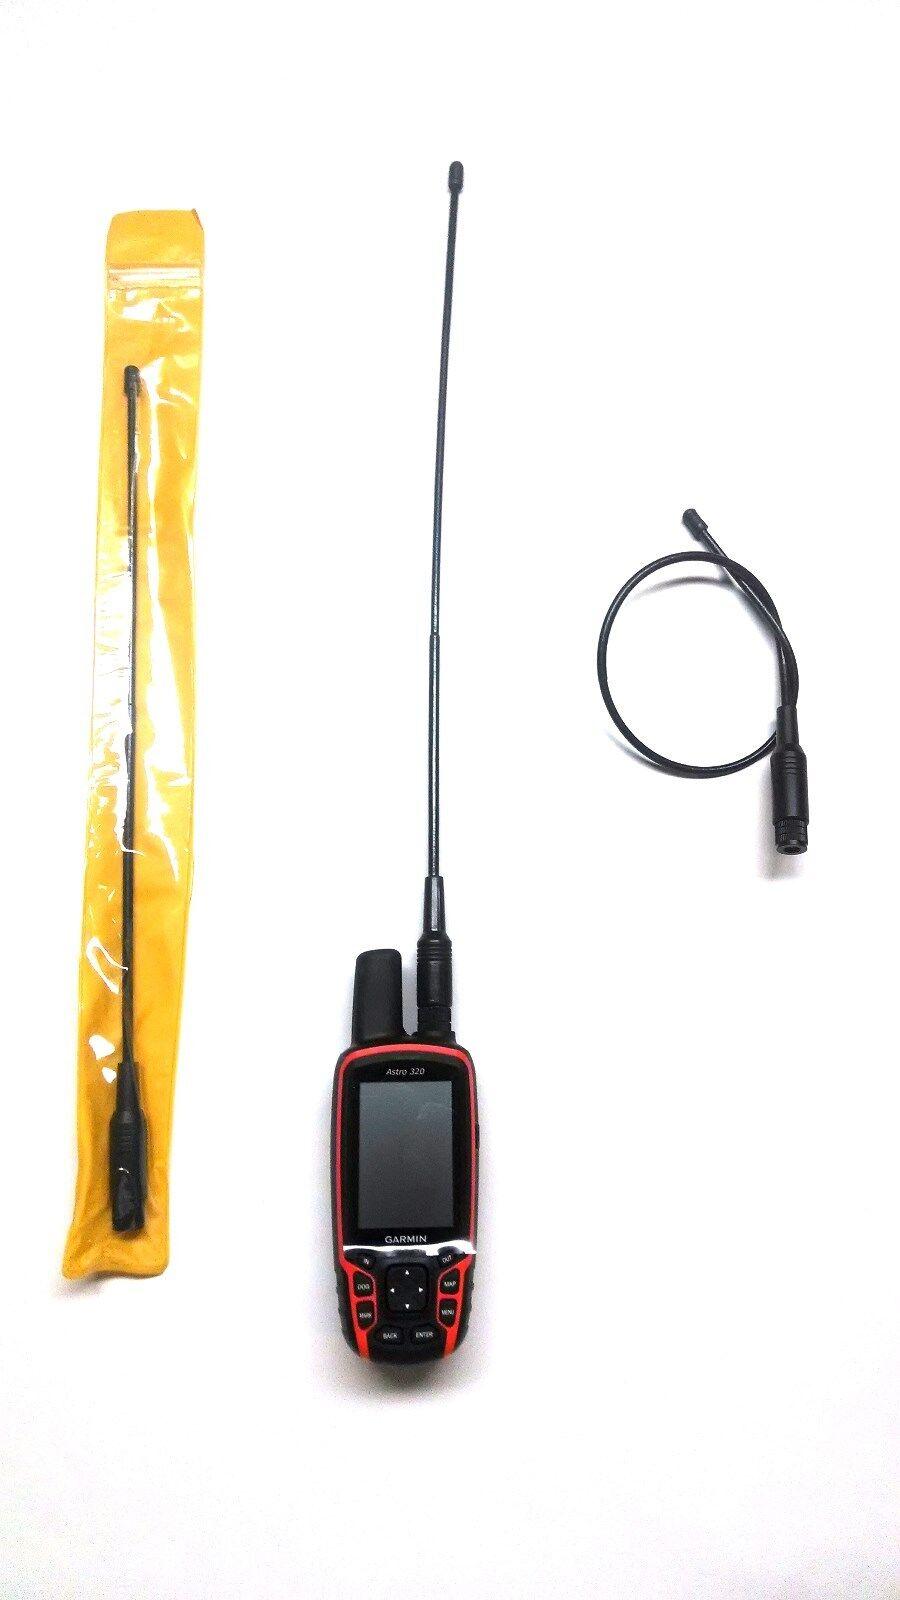 320 Long Range Folding Antenna Garmin Astro 220 Increase Dog System Range